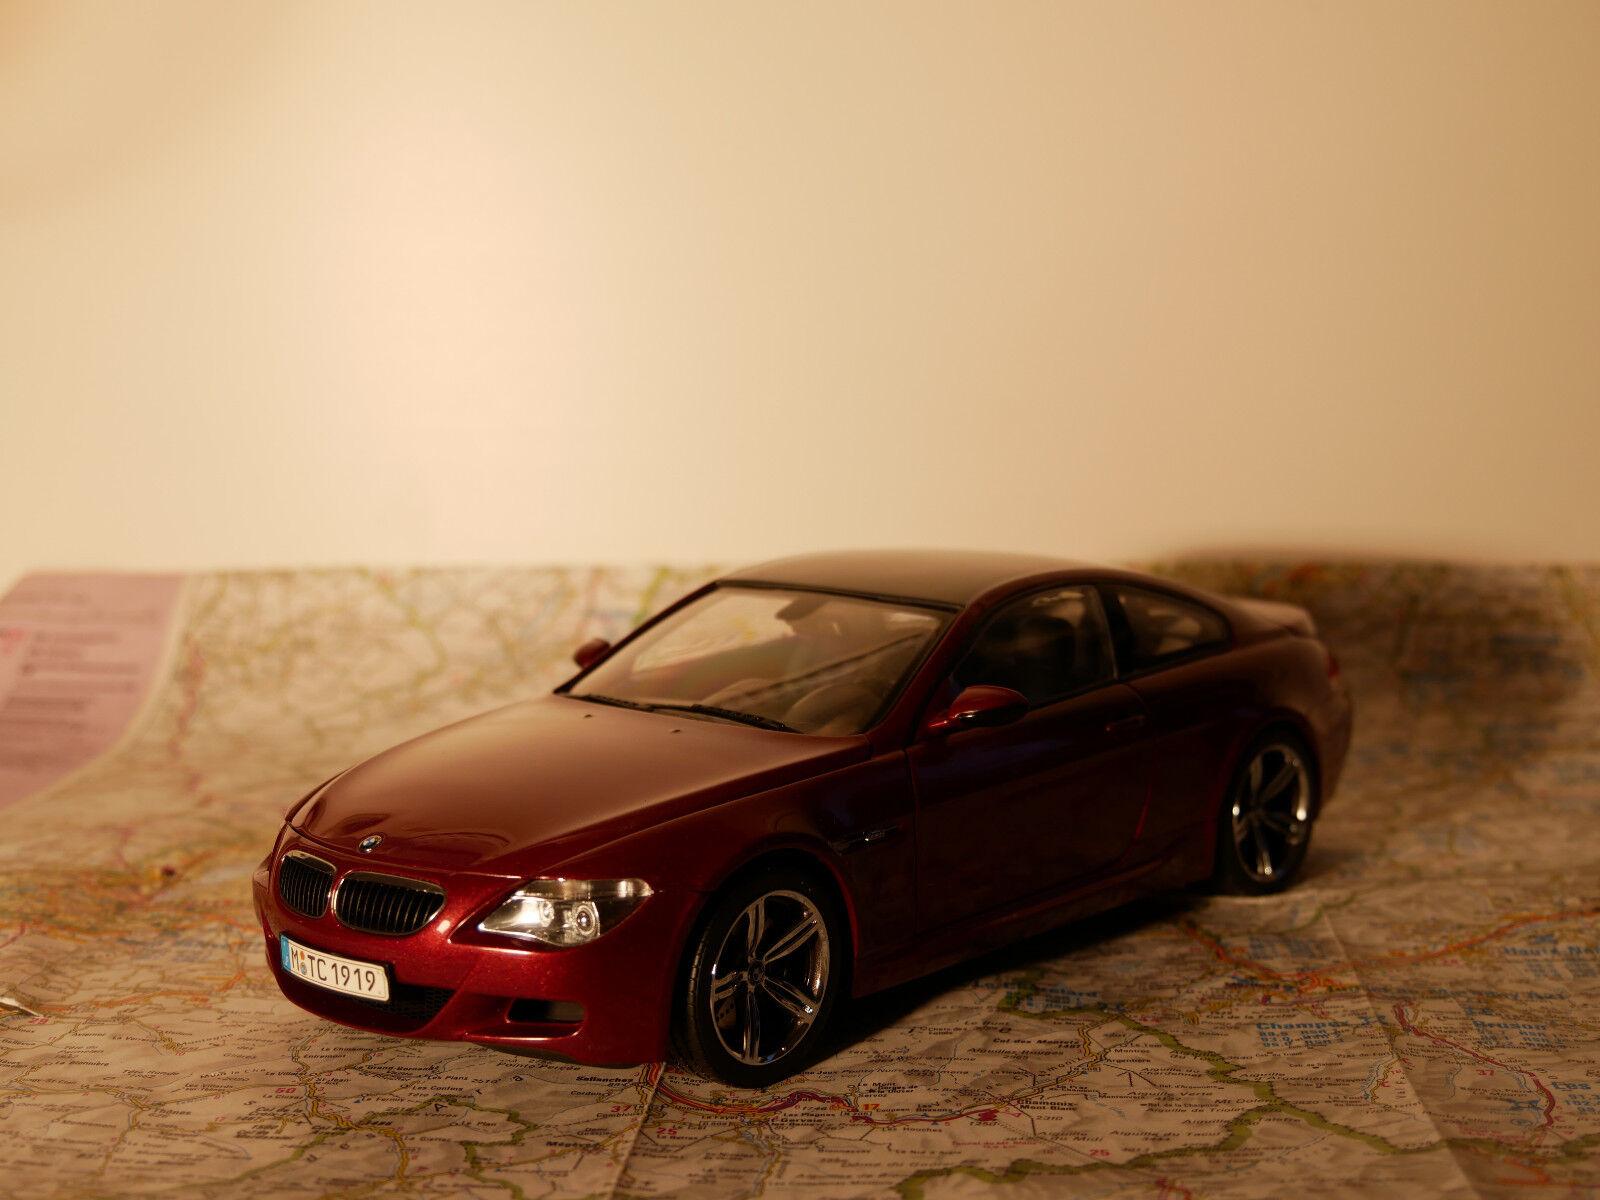 KYOSHO BMW M6 ROT ART.80430398134 BWM - DEALER- VERSION + BOX  1:18  NEW